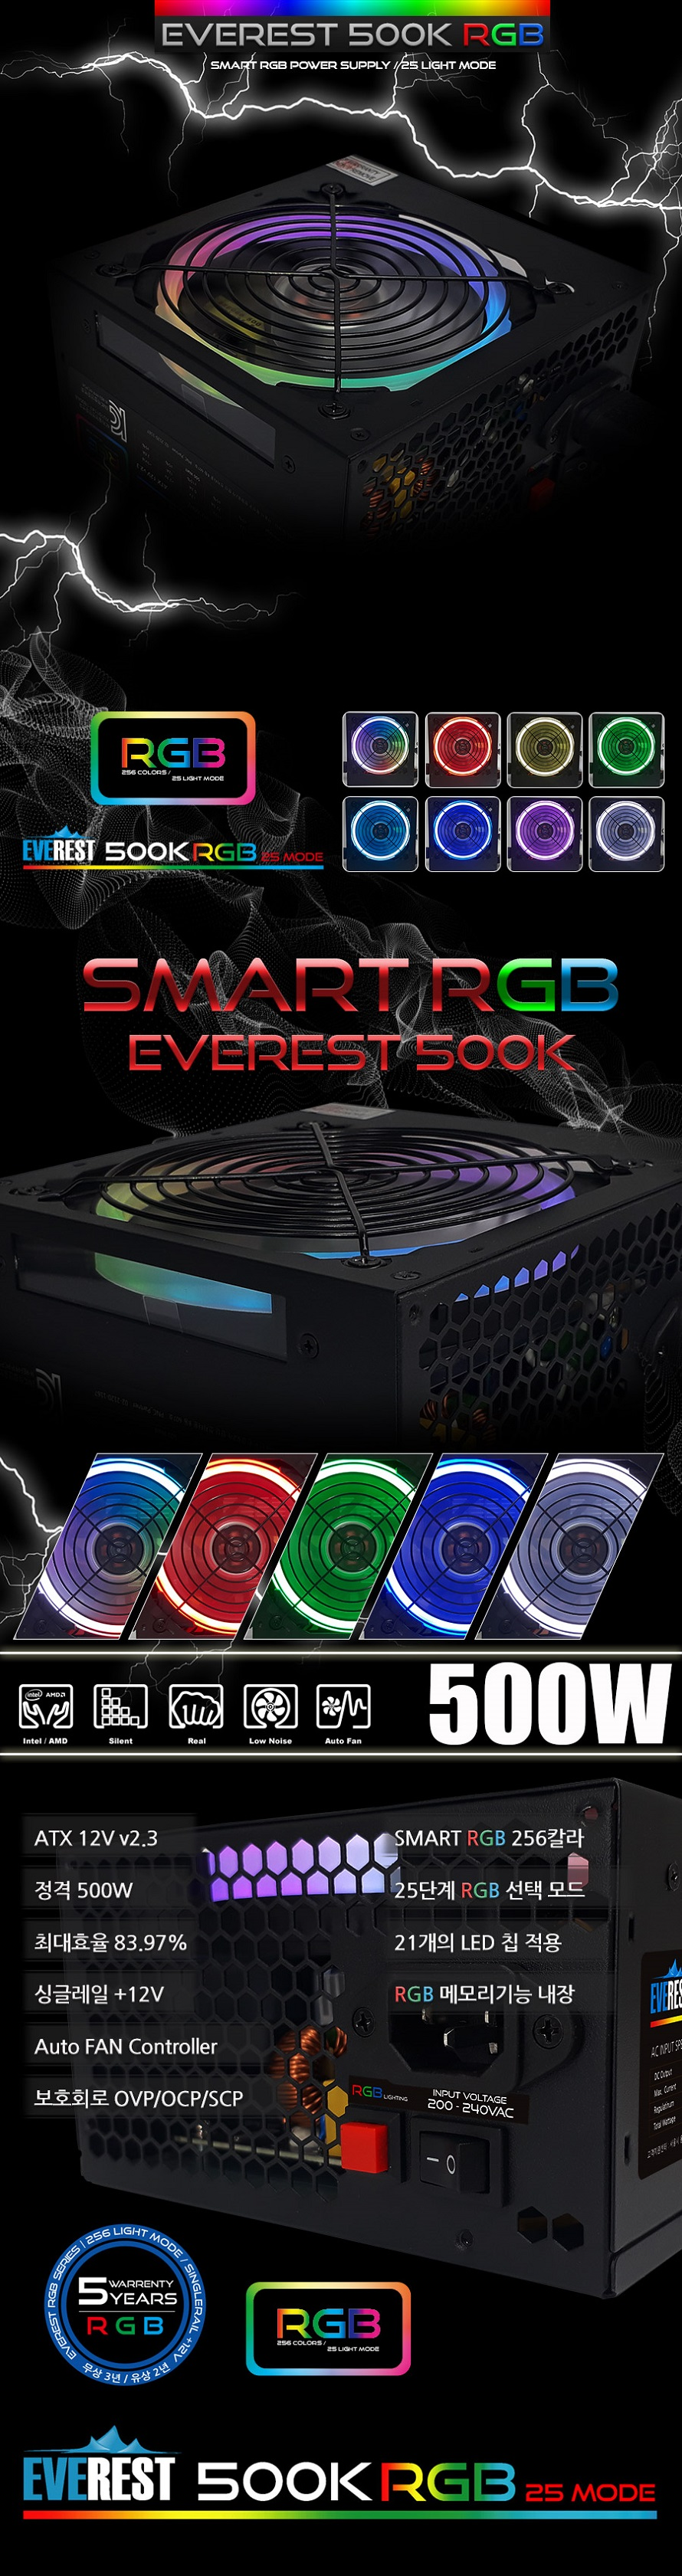 PNC PARTNER   EVEREST 500K RGB